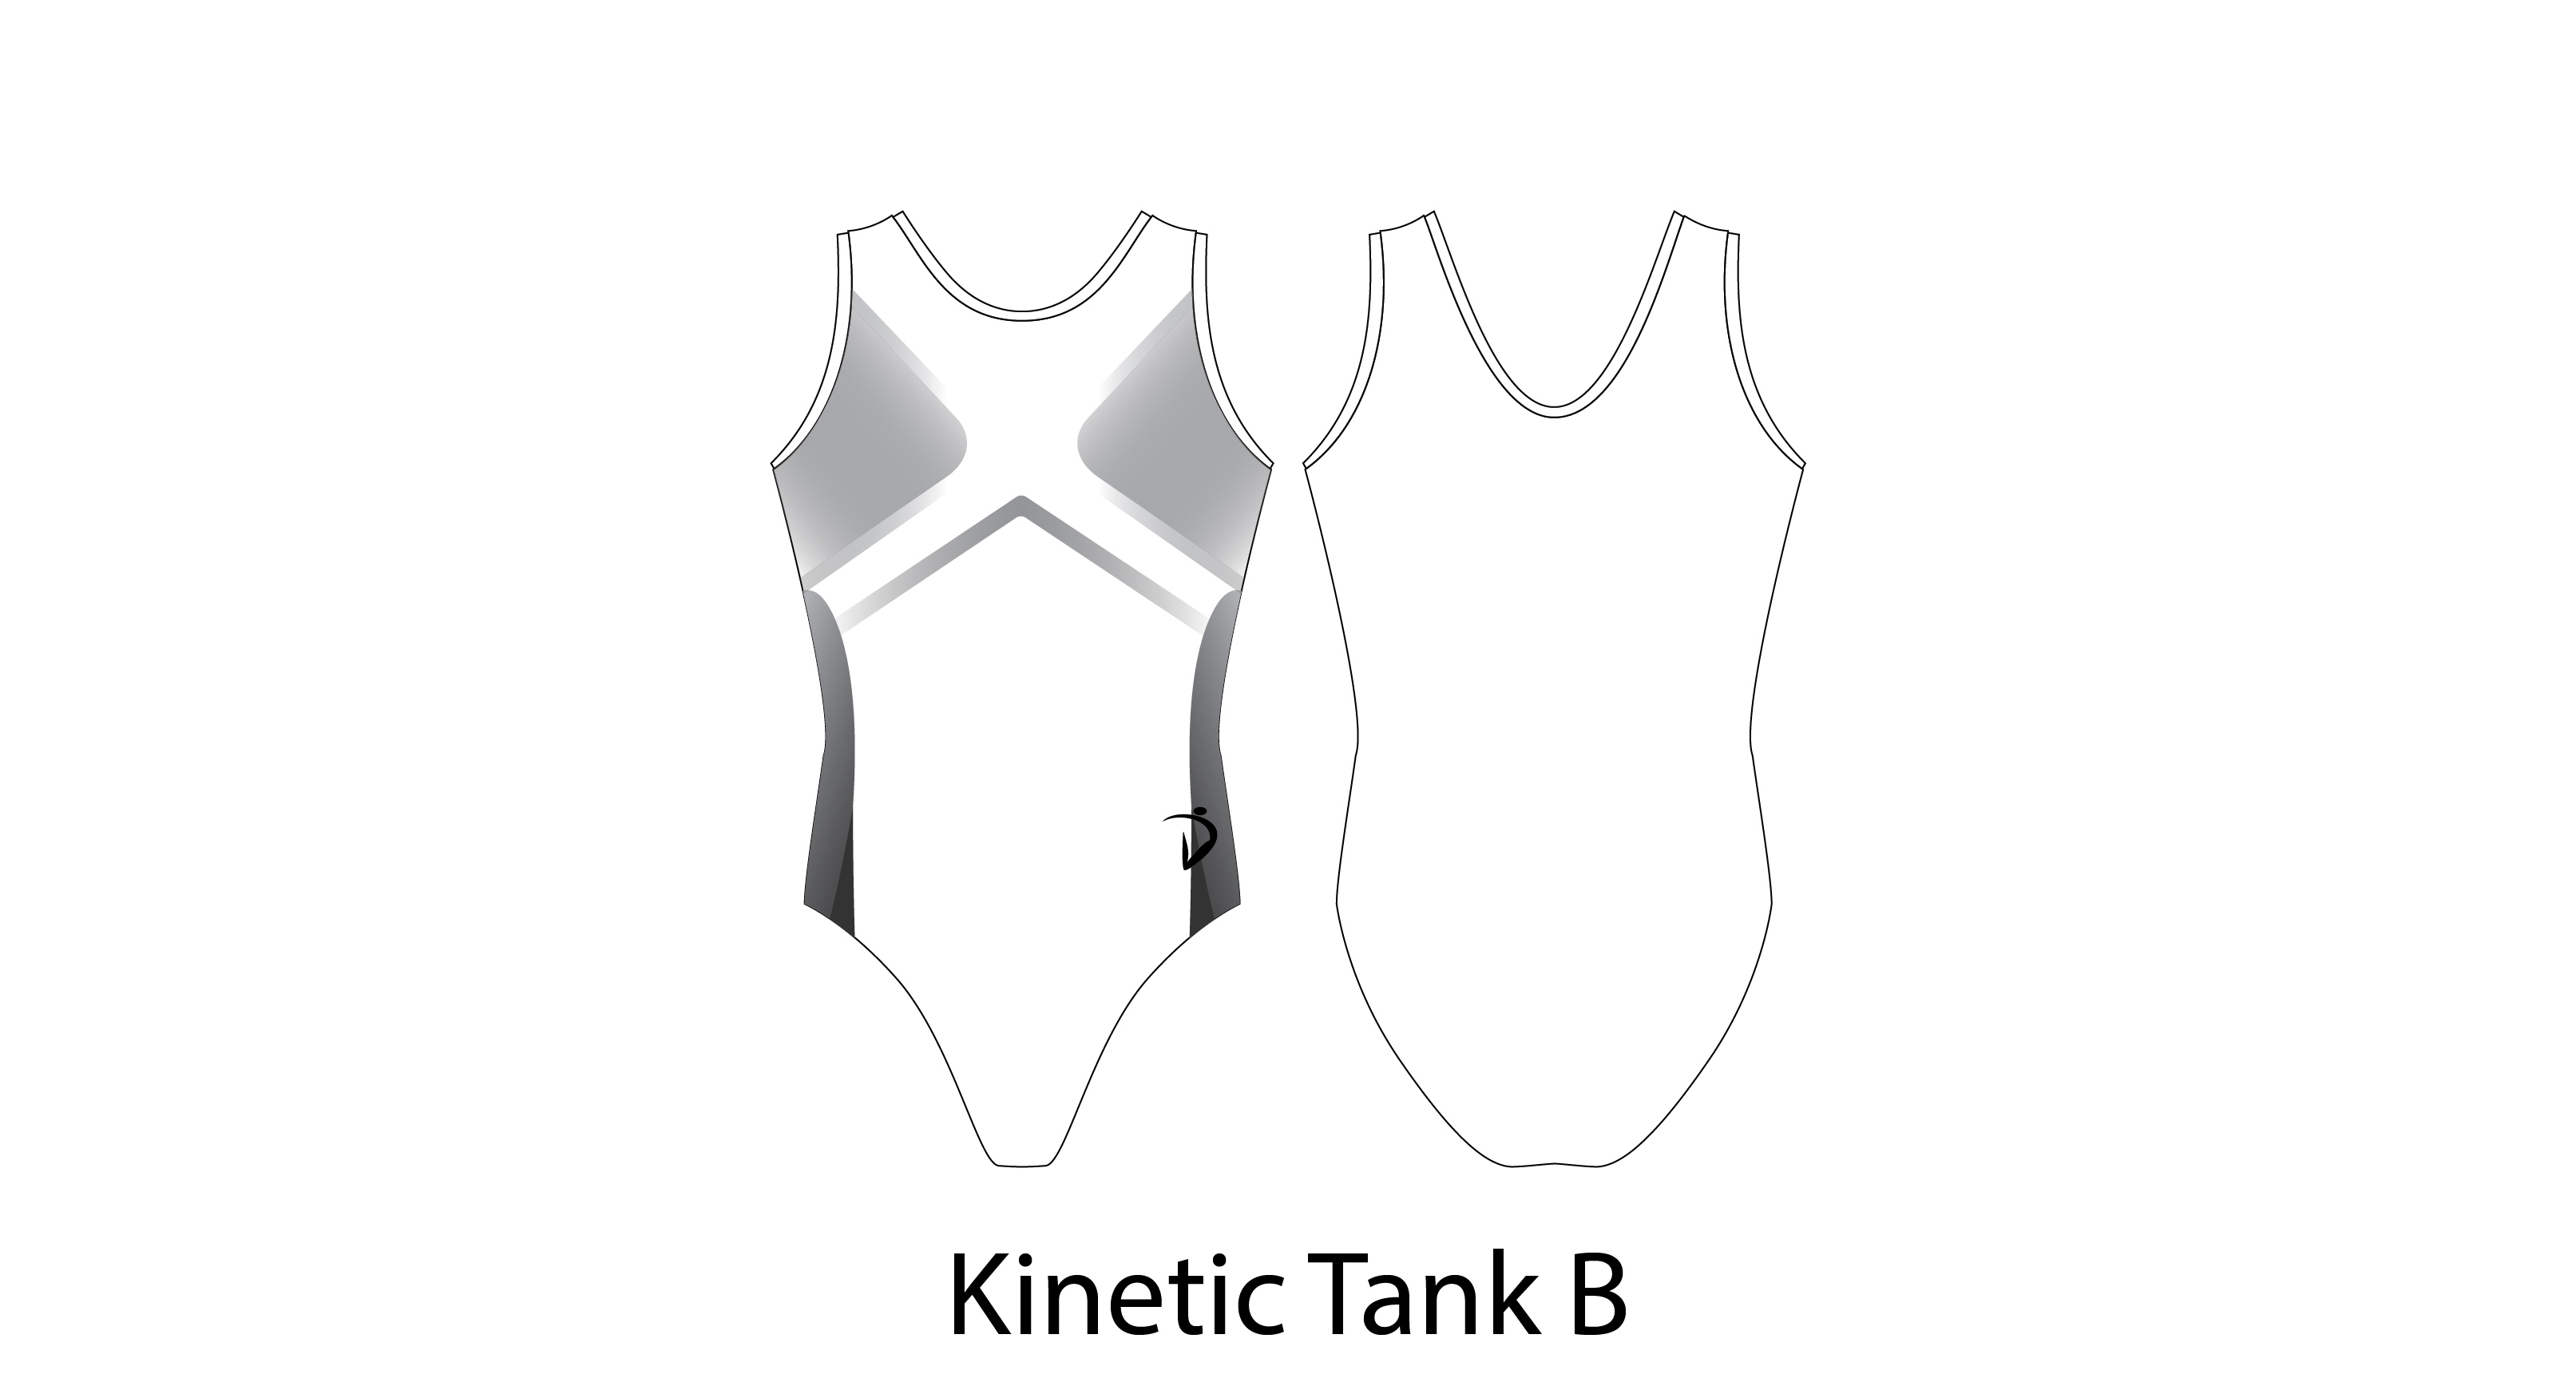 Kinetic Tank B